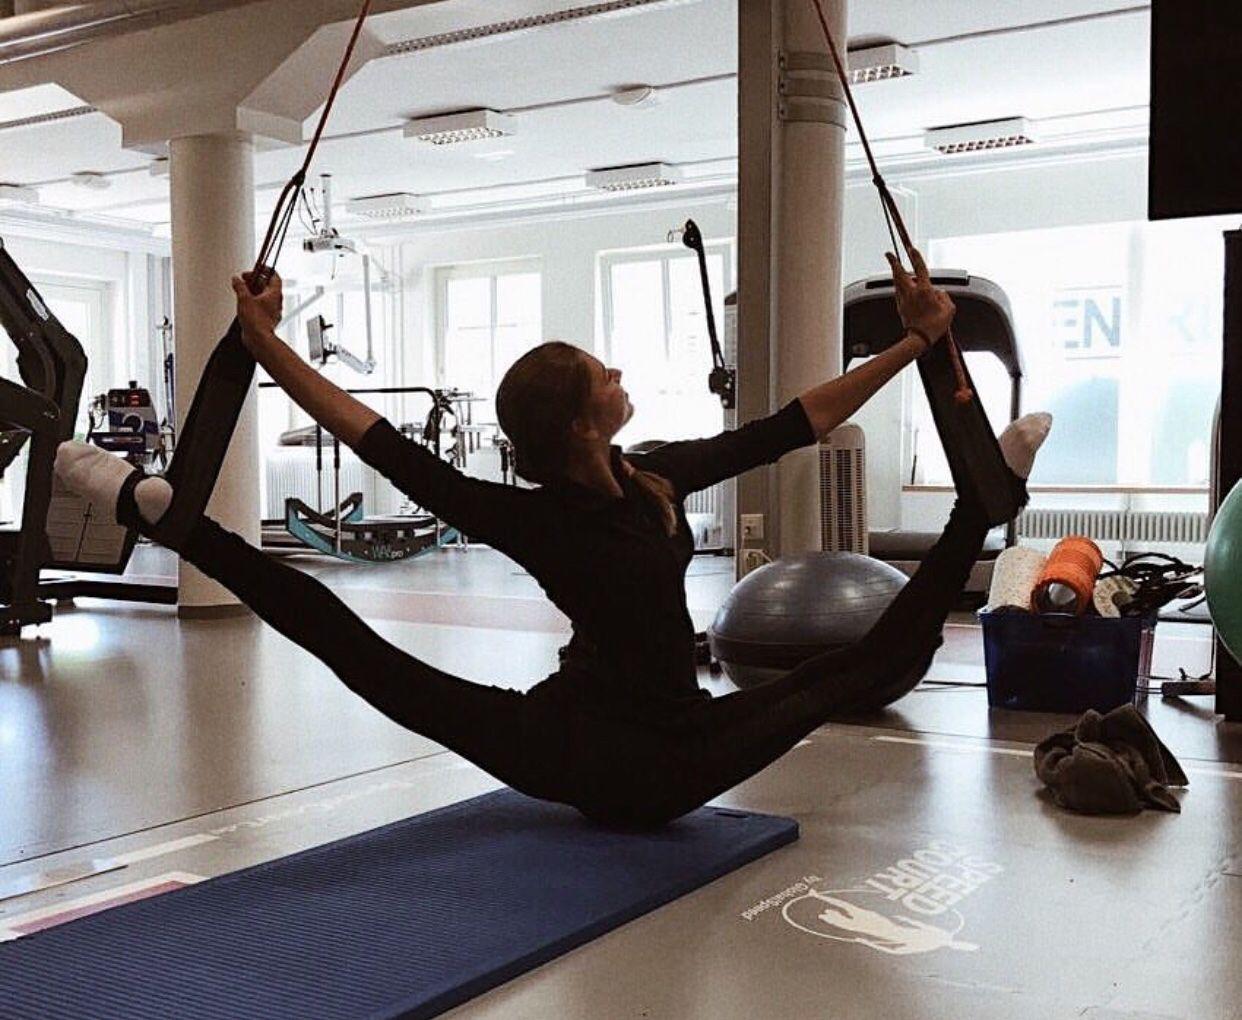 Pin by Emily Shuler on Dance Gymnastics training